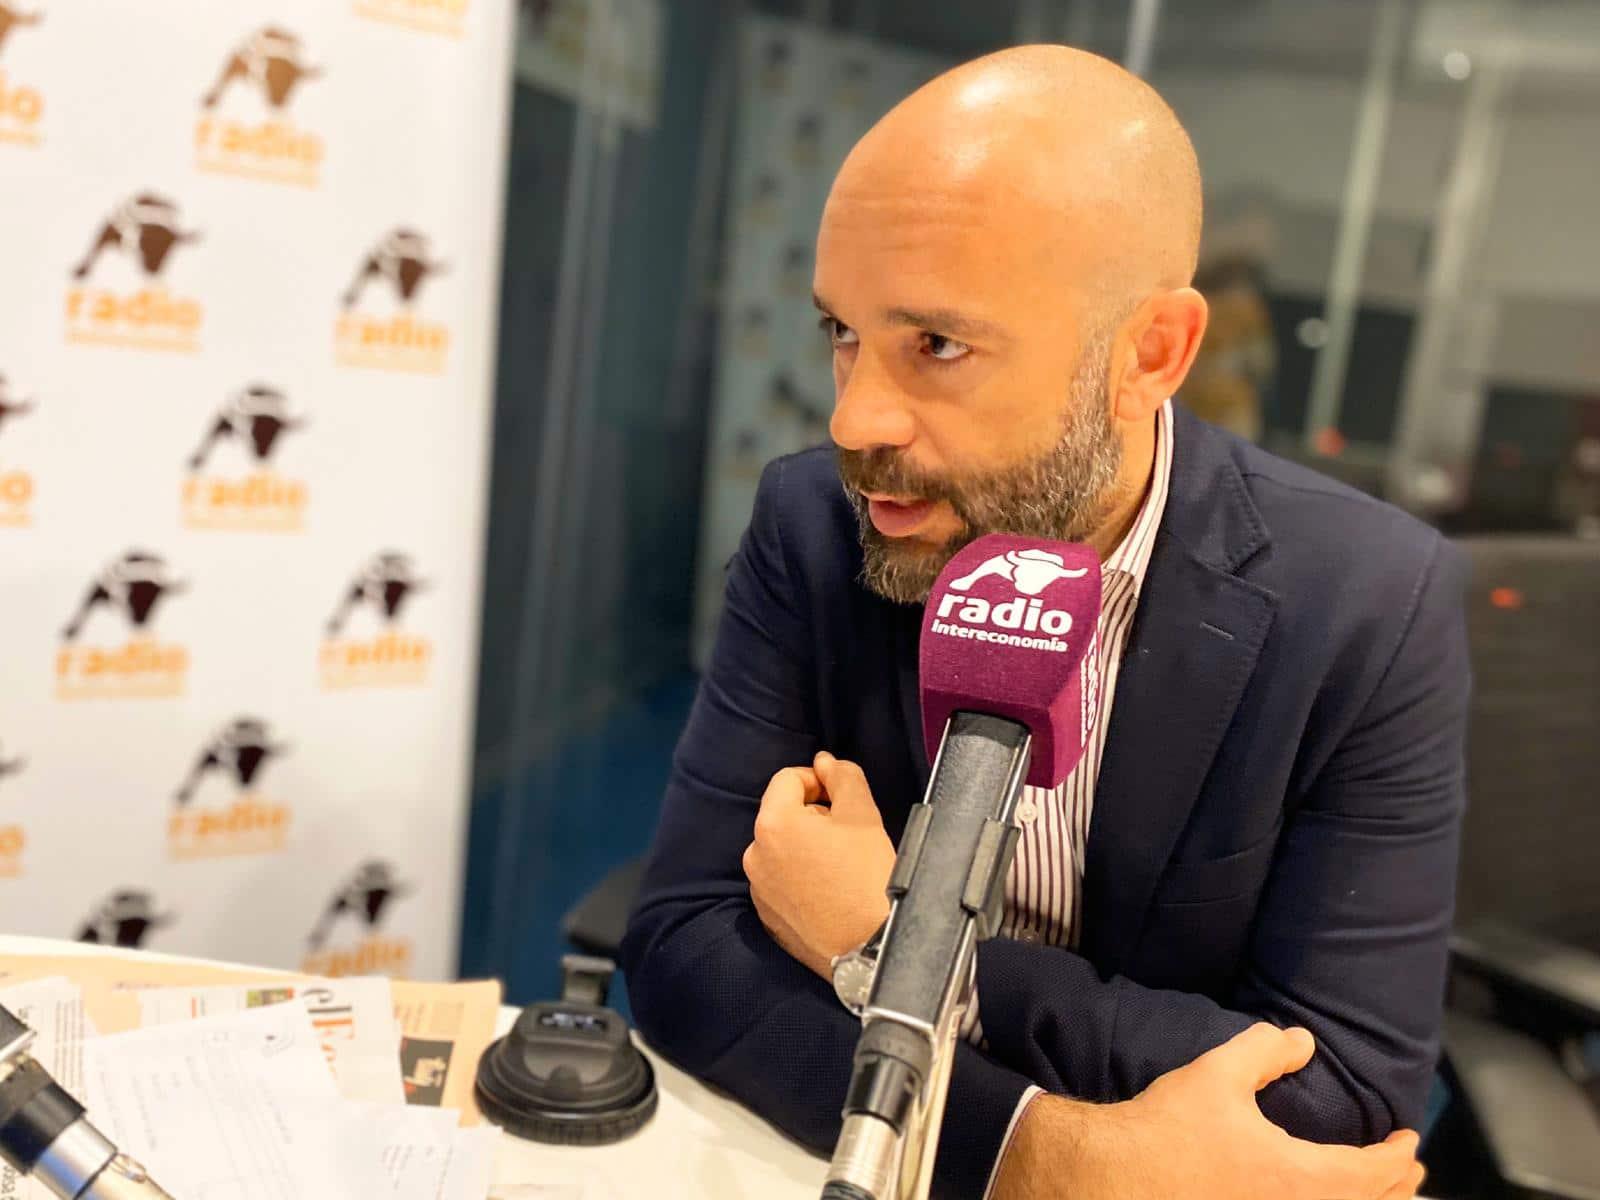 ING: 'En España seguimos comercializando los fondos de inversión más caros de Europa'